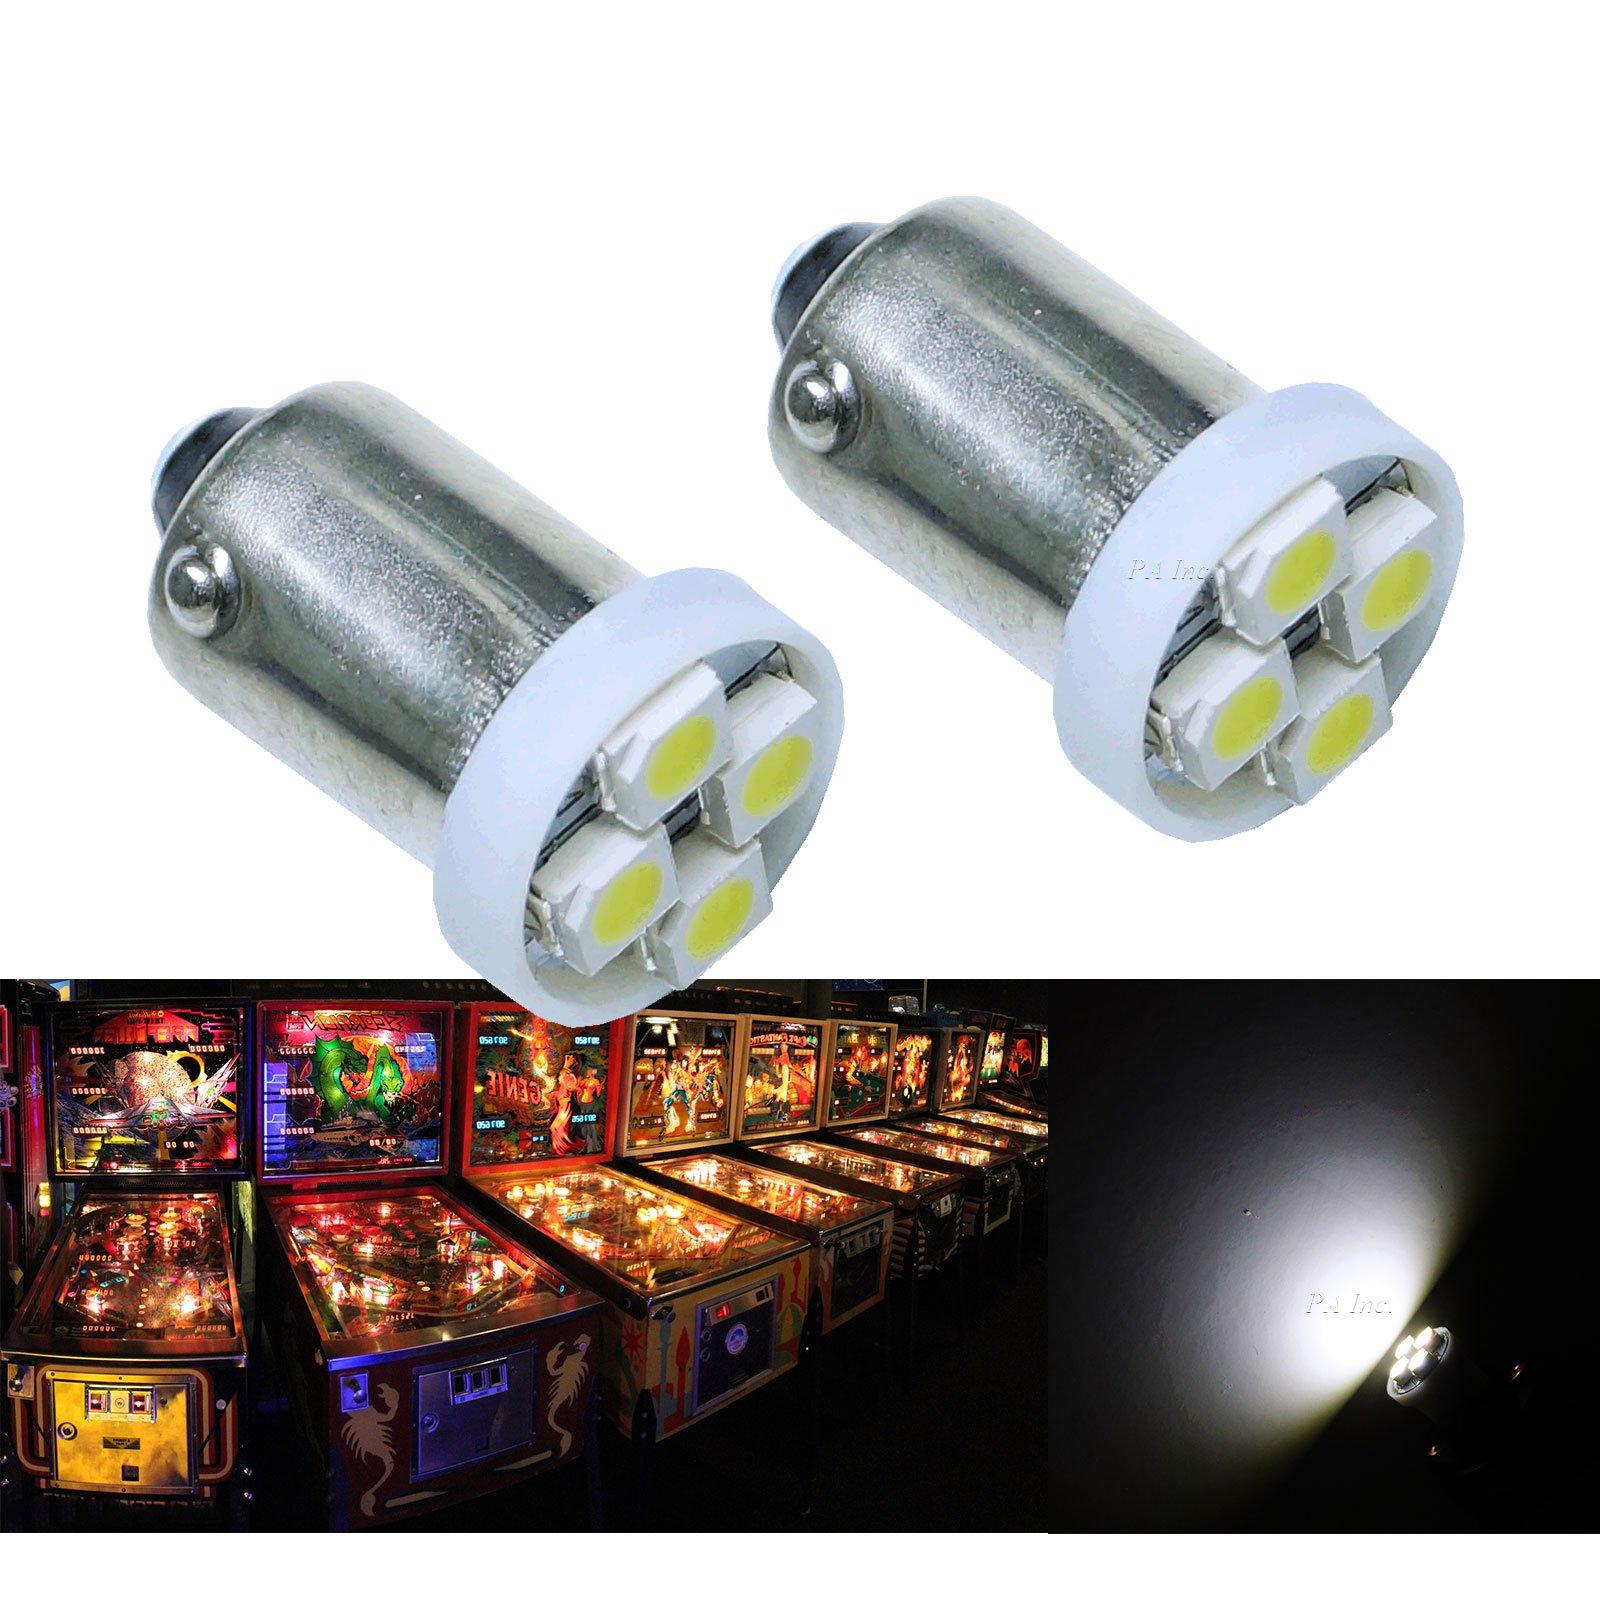 PA® 10PCS #1893 #44 #47 #756 #1847 BA9S 4SMD LED Wedge Pinball Machine Light Bulb White-6.3V